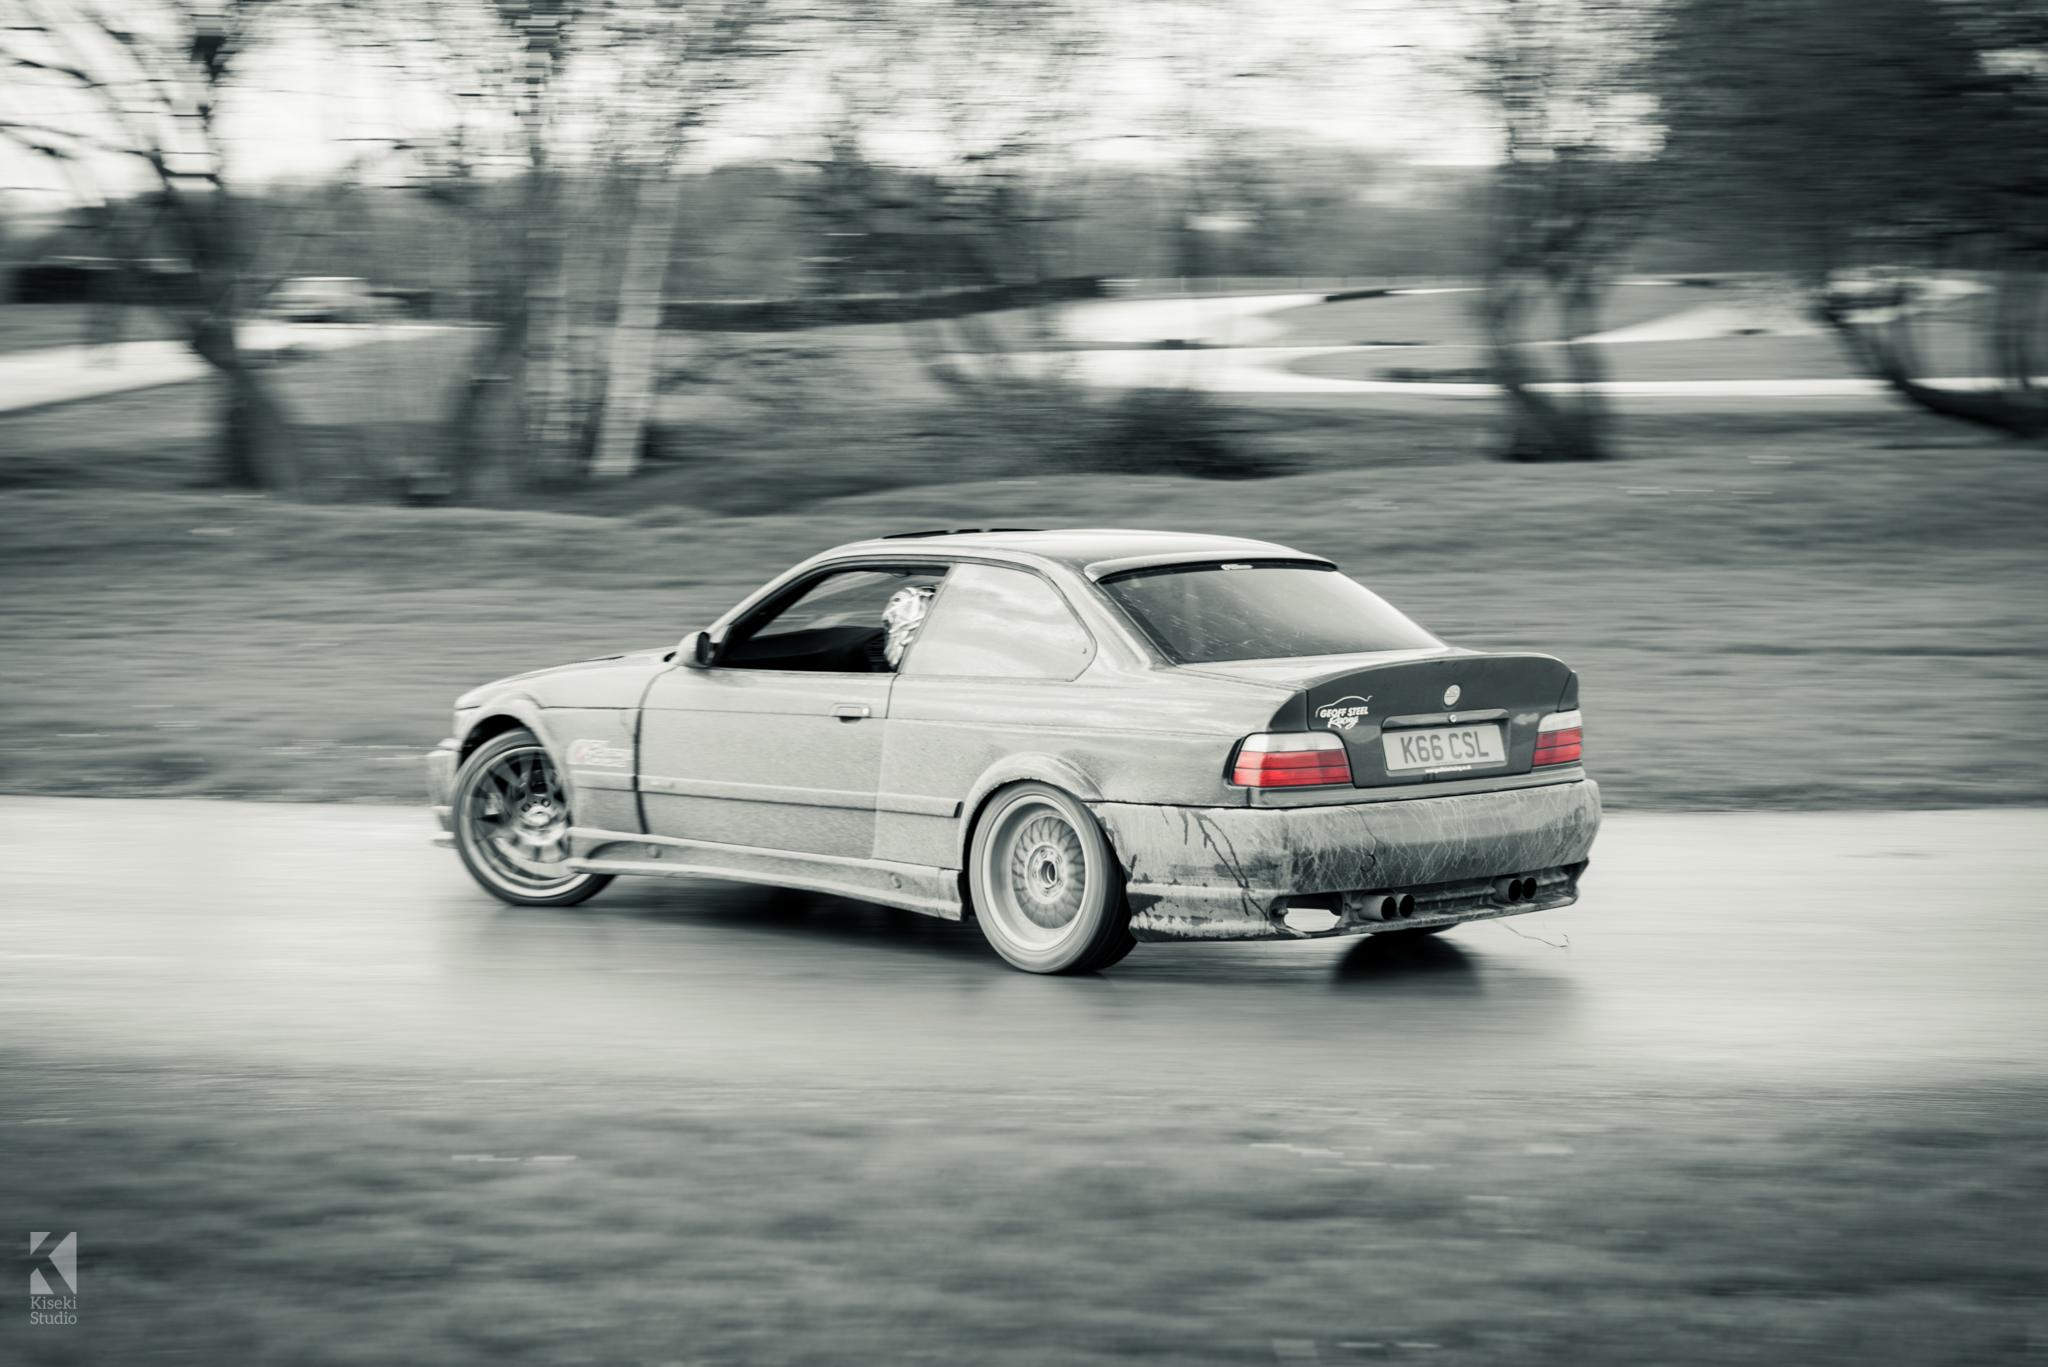 BMW M3 E36 drifting